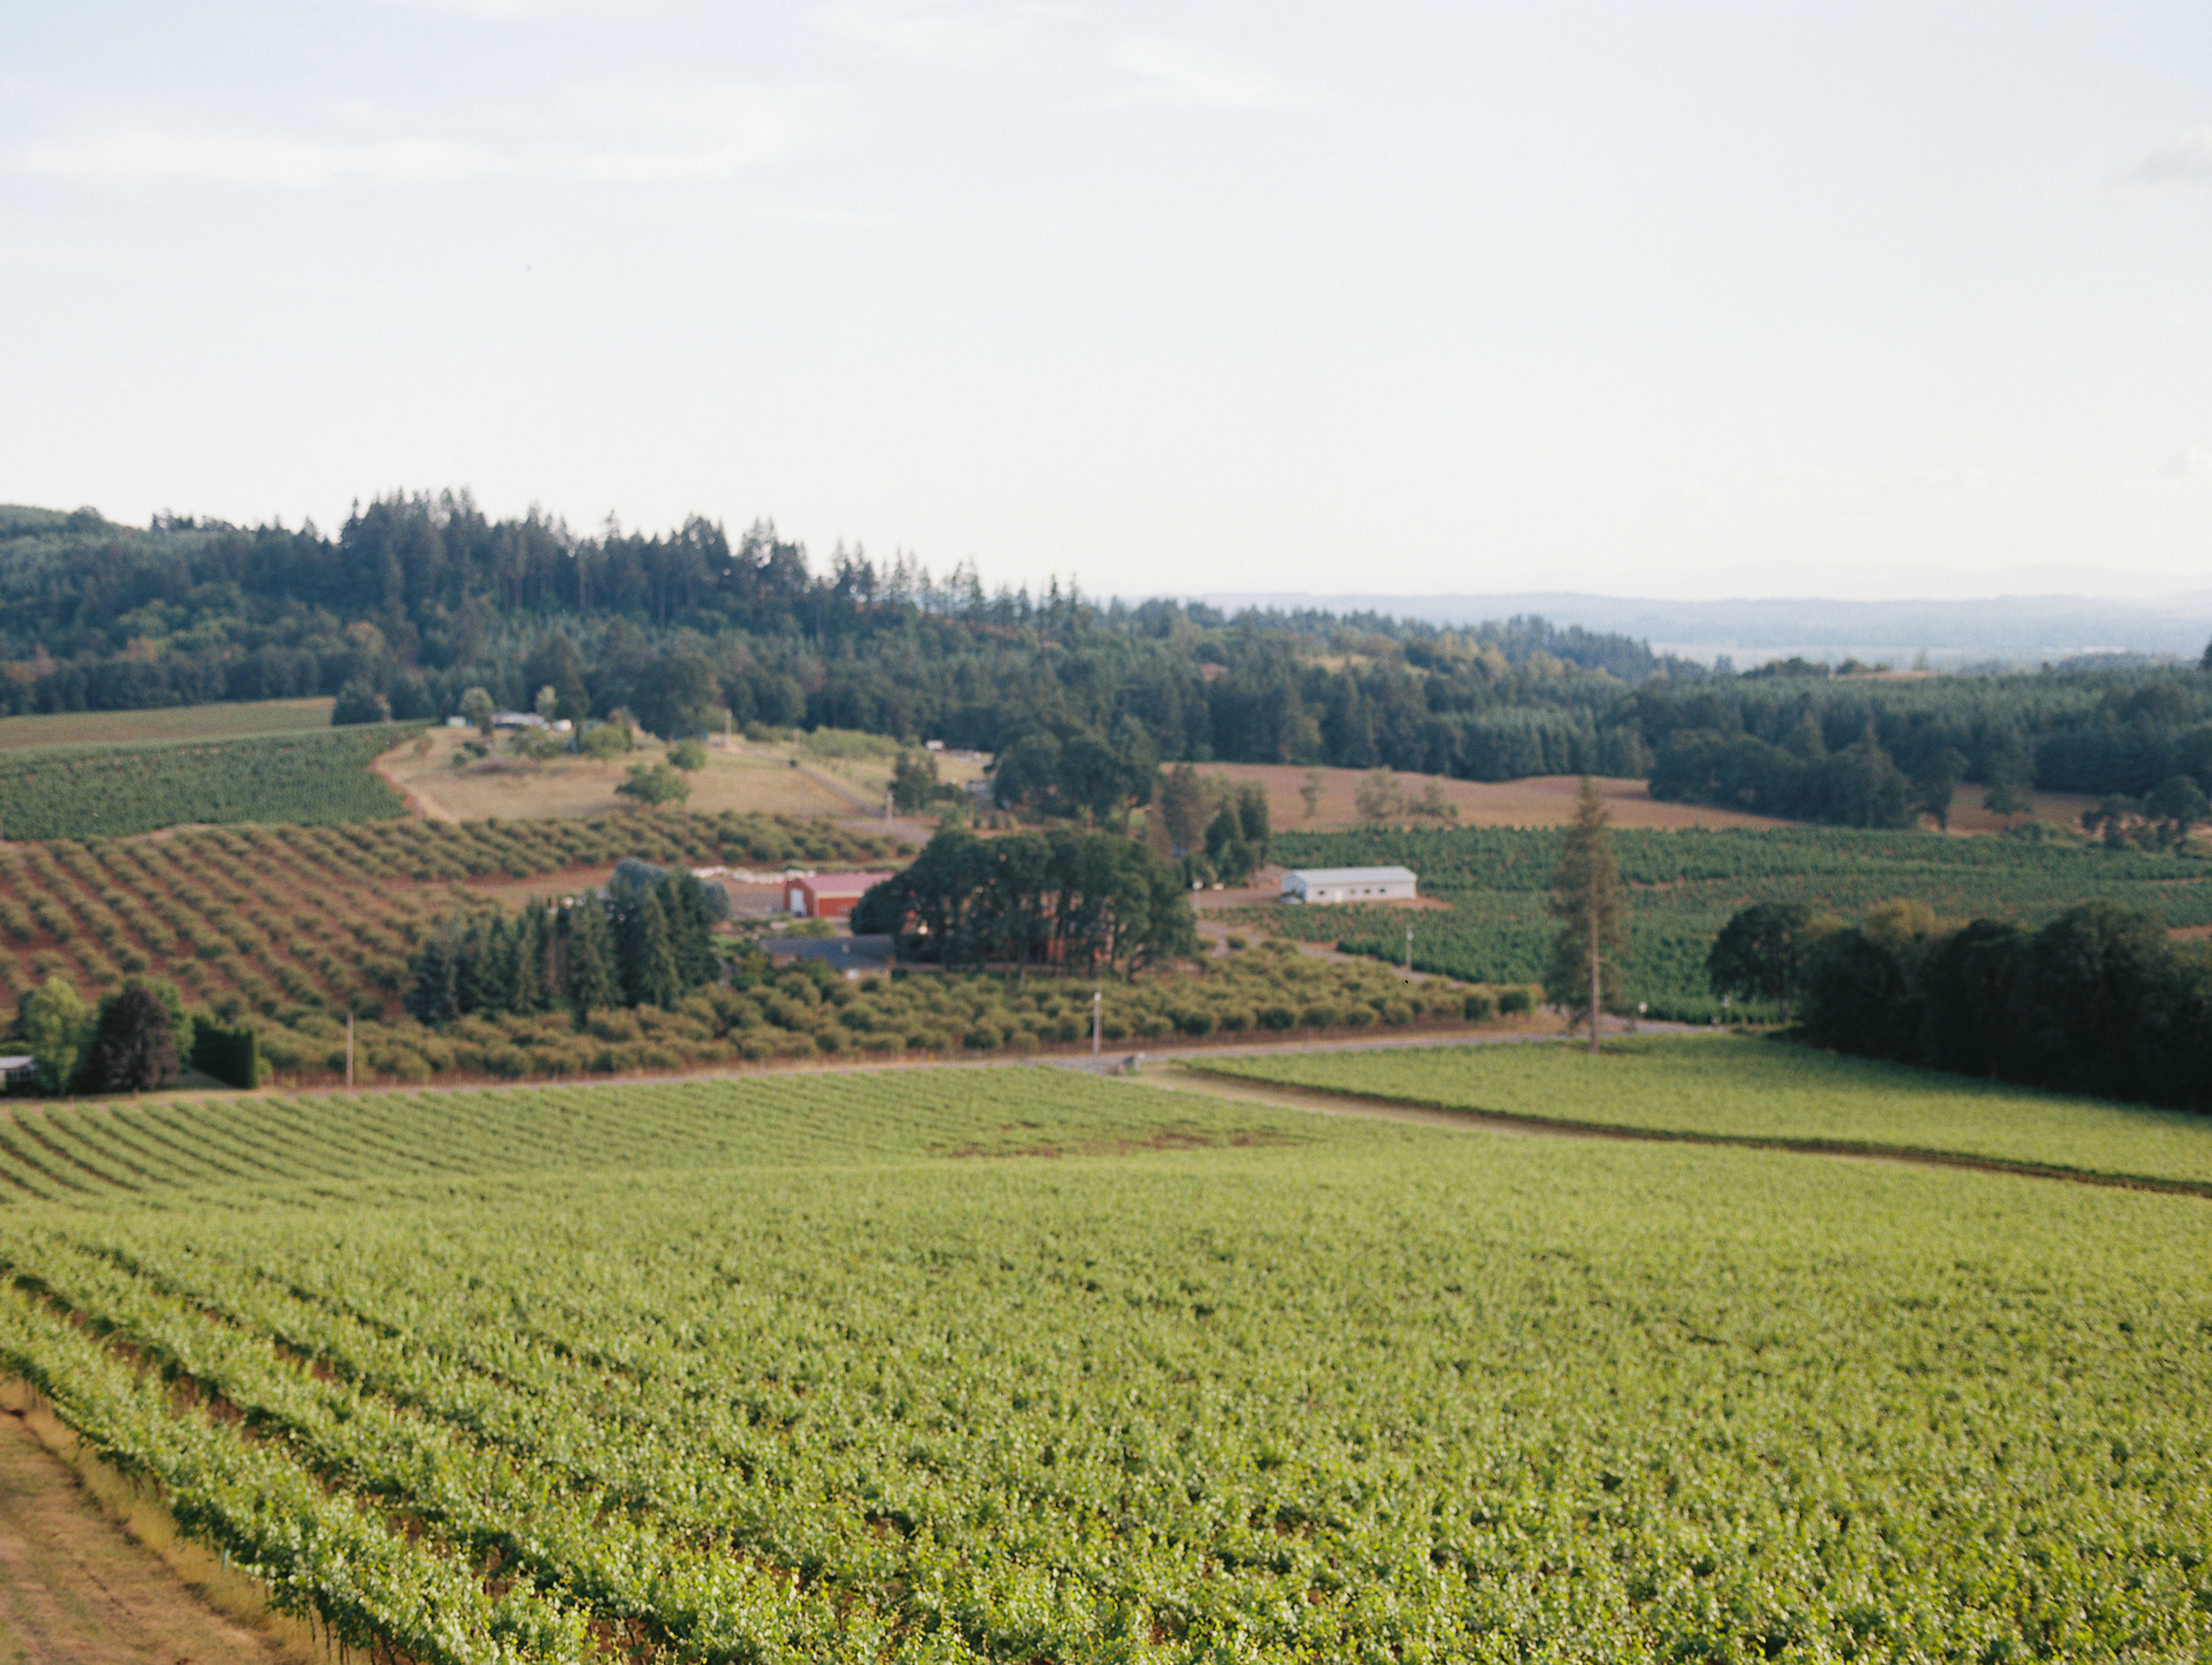 romantic-willamette-valley-vineyards-wedding-photography-33.jpg